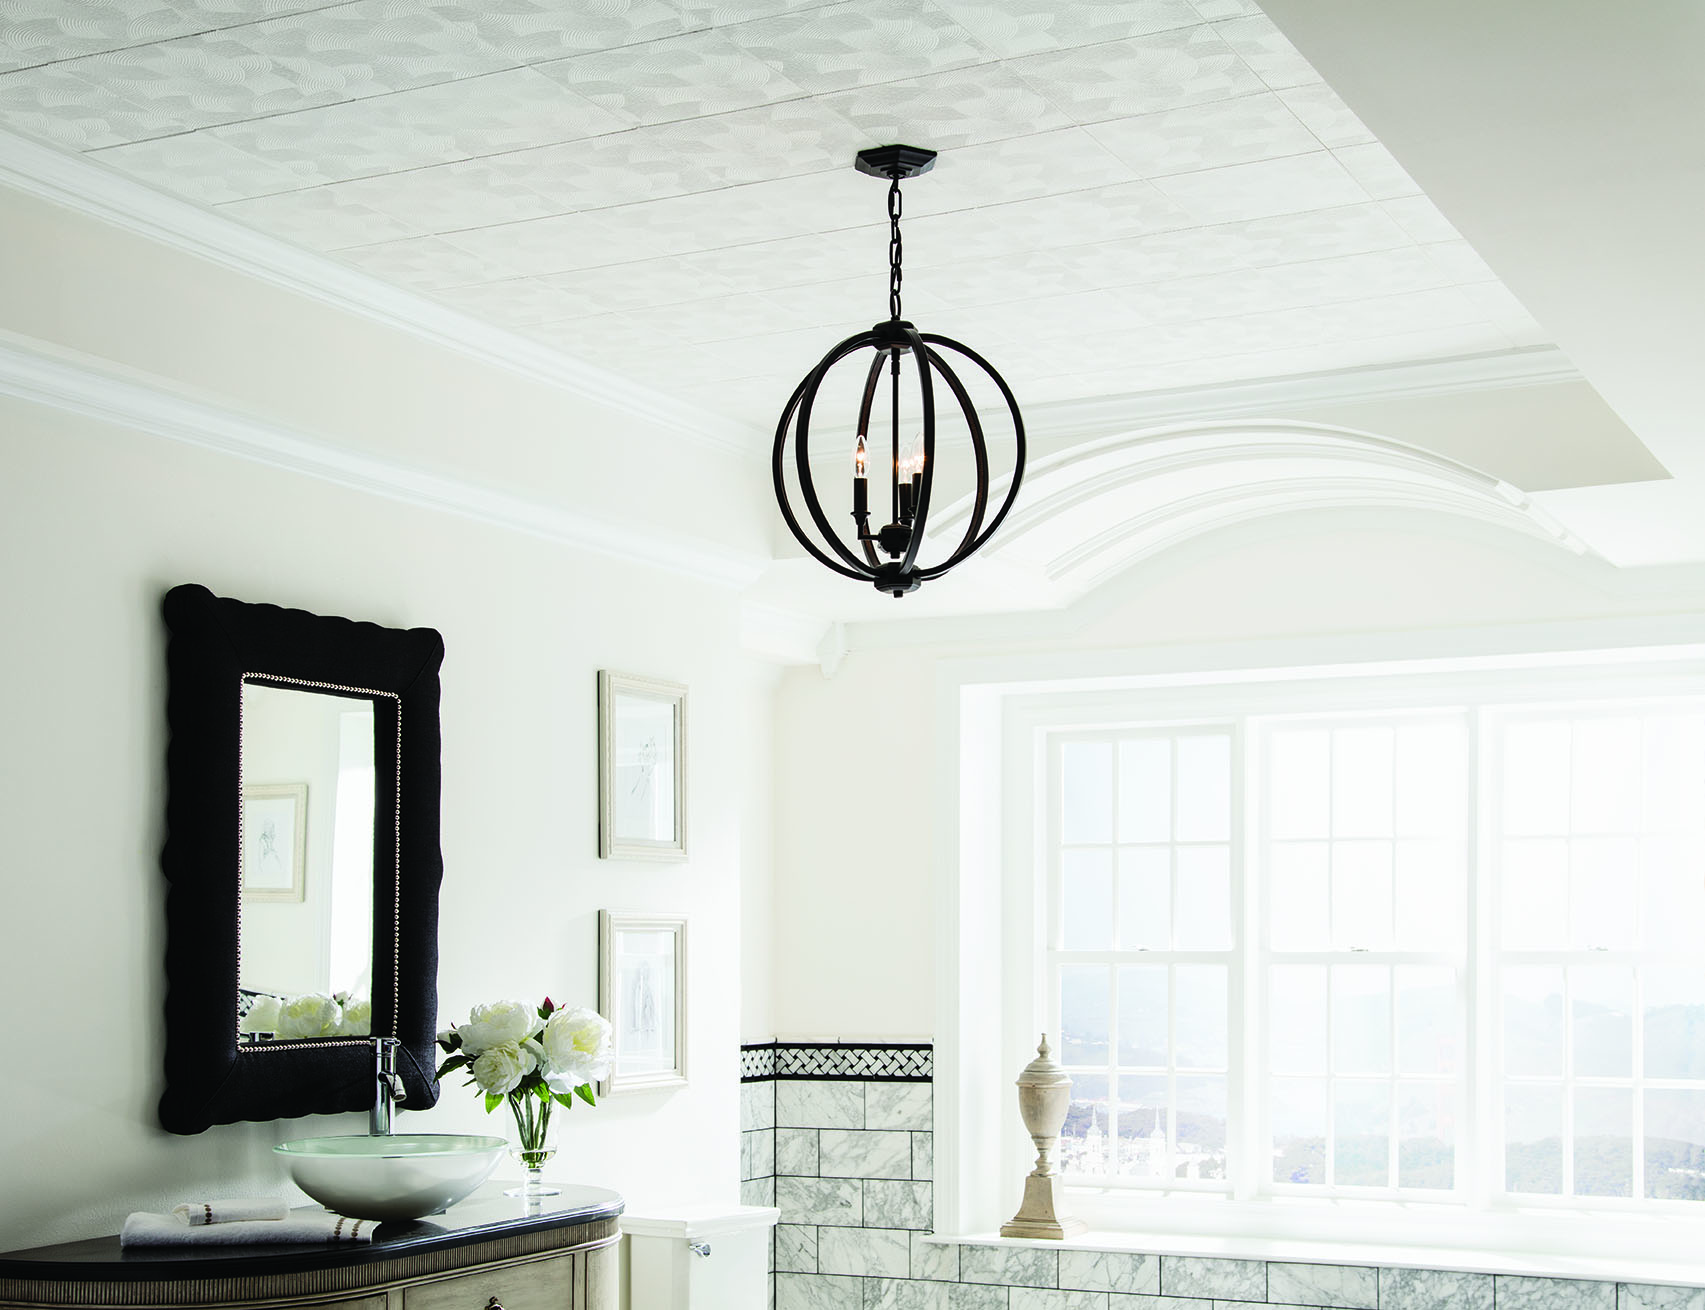 Delighted 12X24 Ceramic Tile Patterns Huge 18X18 Ceramic Floor Tile Square 24X24 Drop Ceiling Tiles 6 X 12 Subway Tile Old 8 Inch Ceramic Tile WhiteAcoustic Mineral Fiber Ceiling Tiles 12\